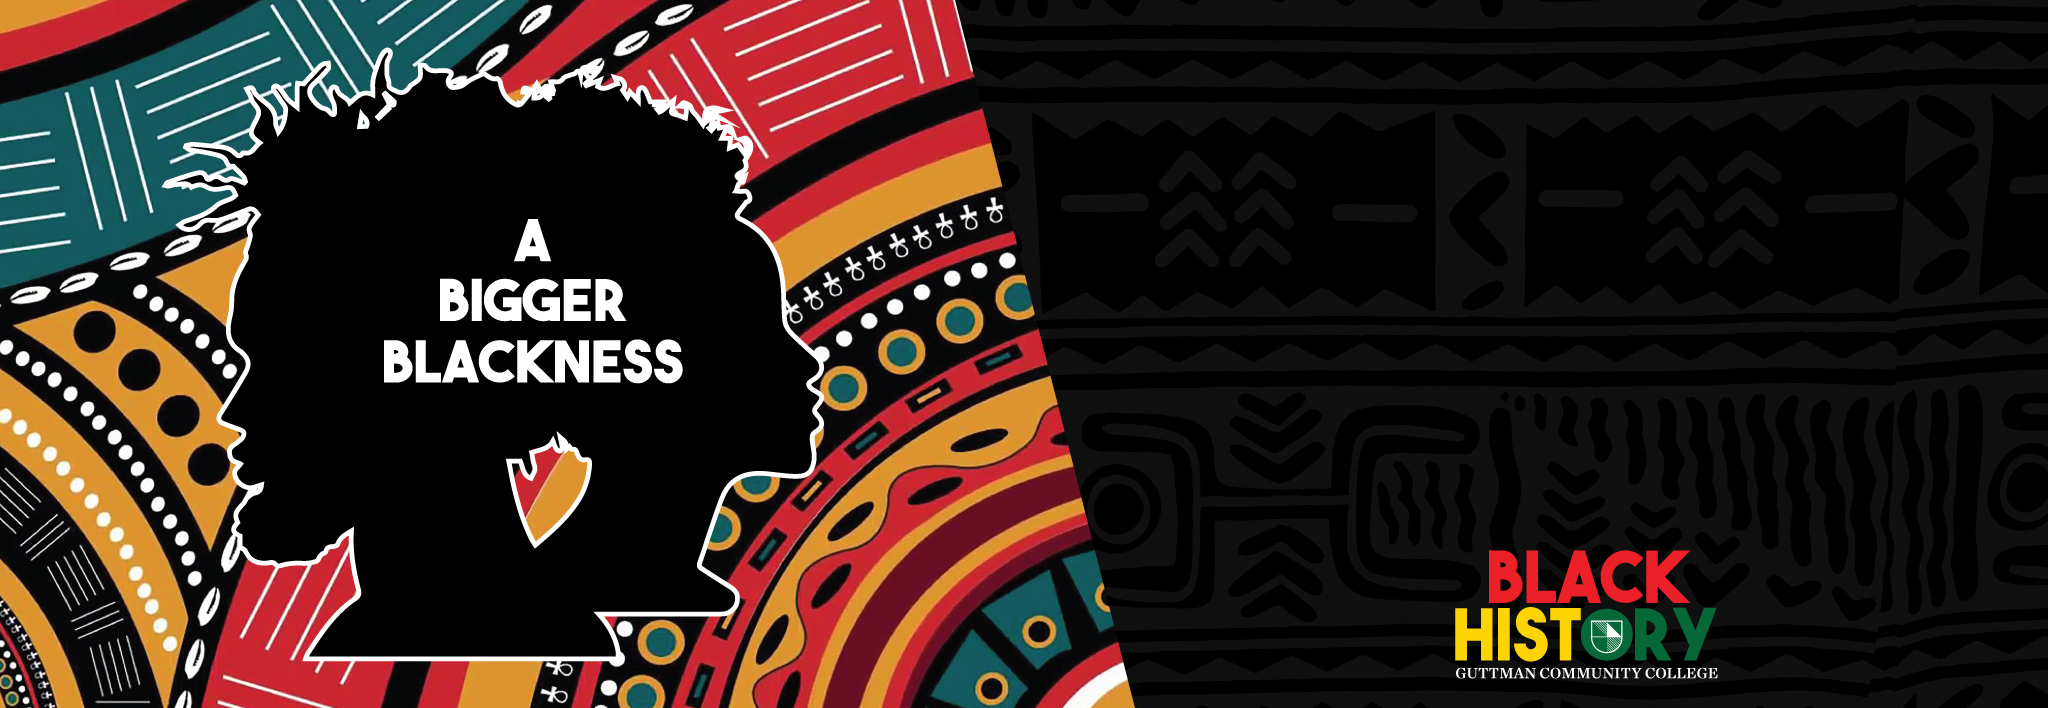 Black History Month theme: a Bigger Blackness